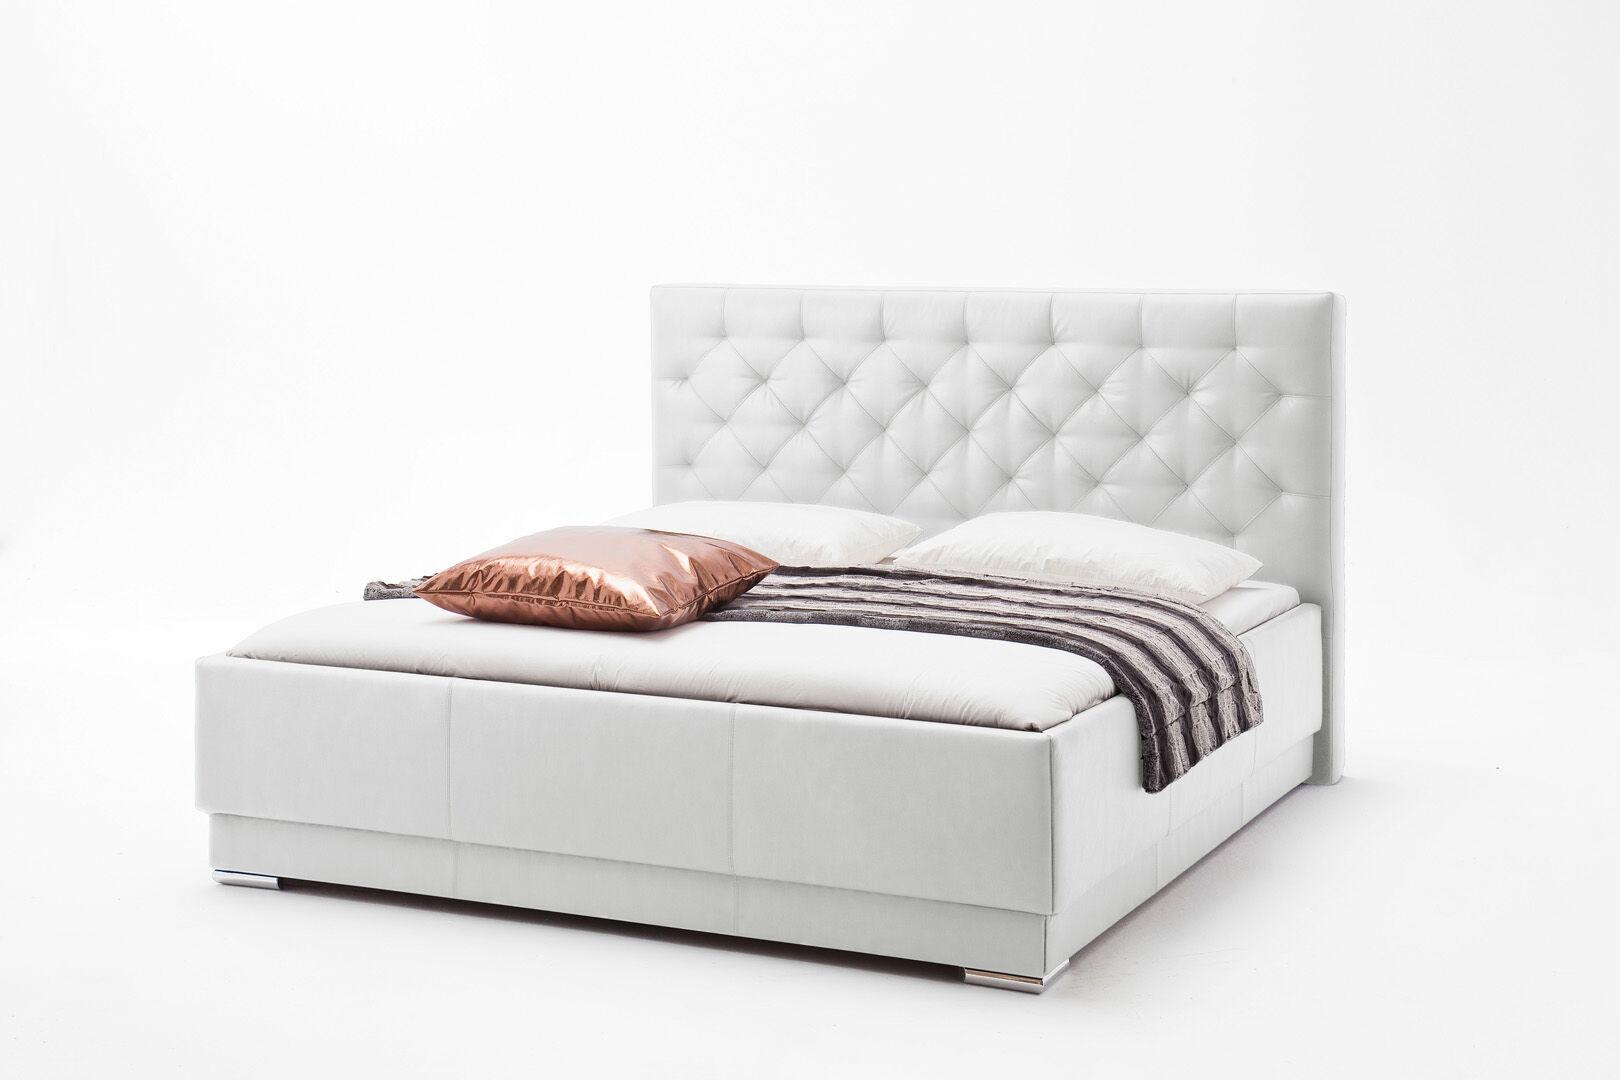 Pisa seng polstret 180x200 cm Hvid